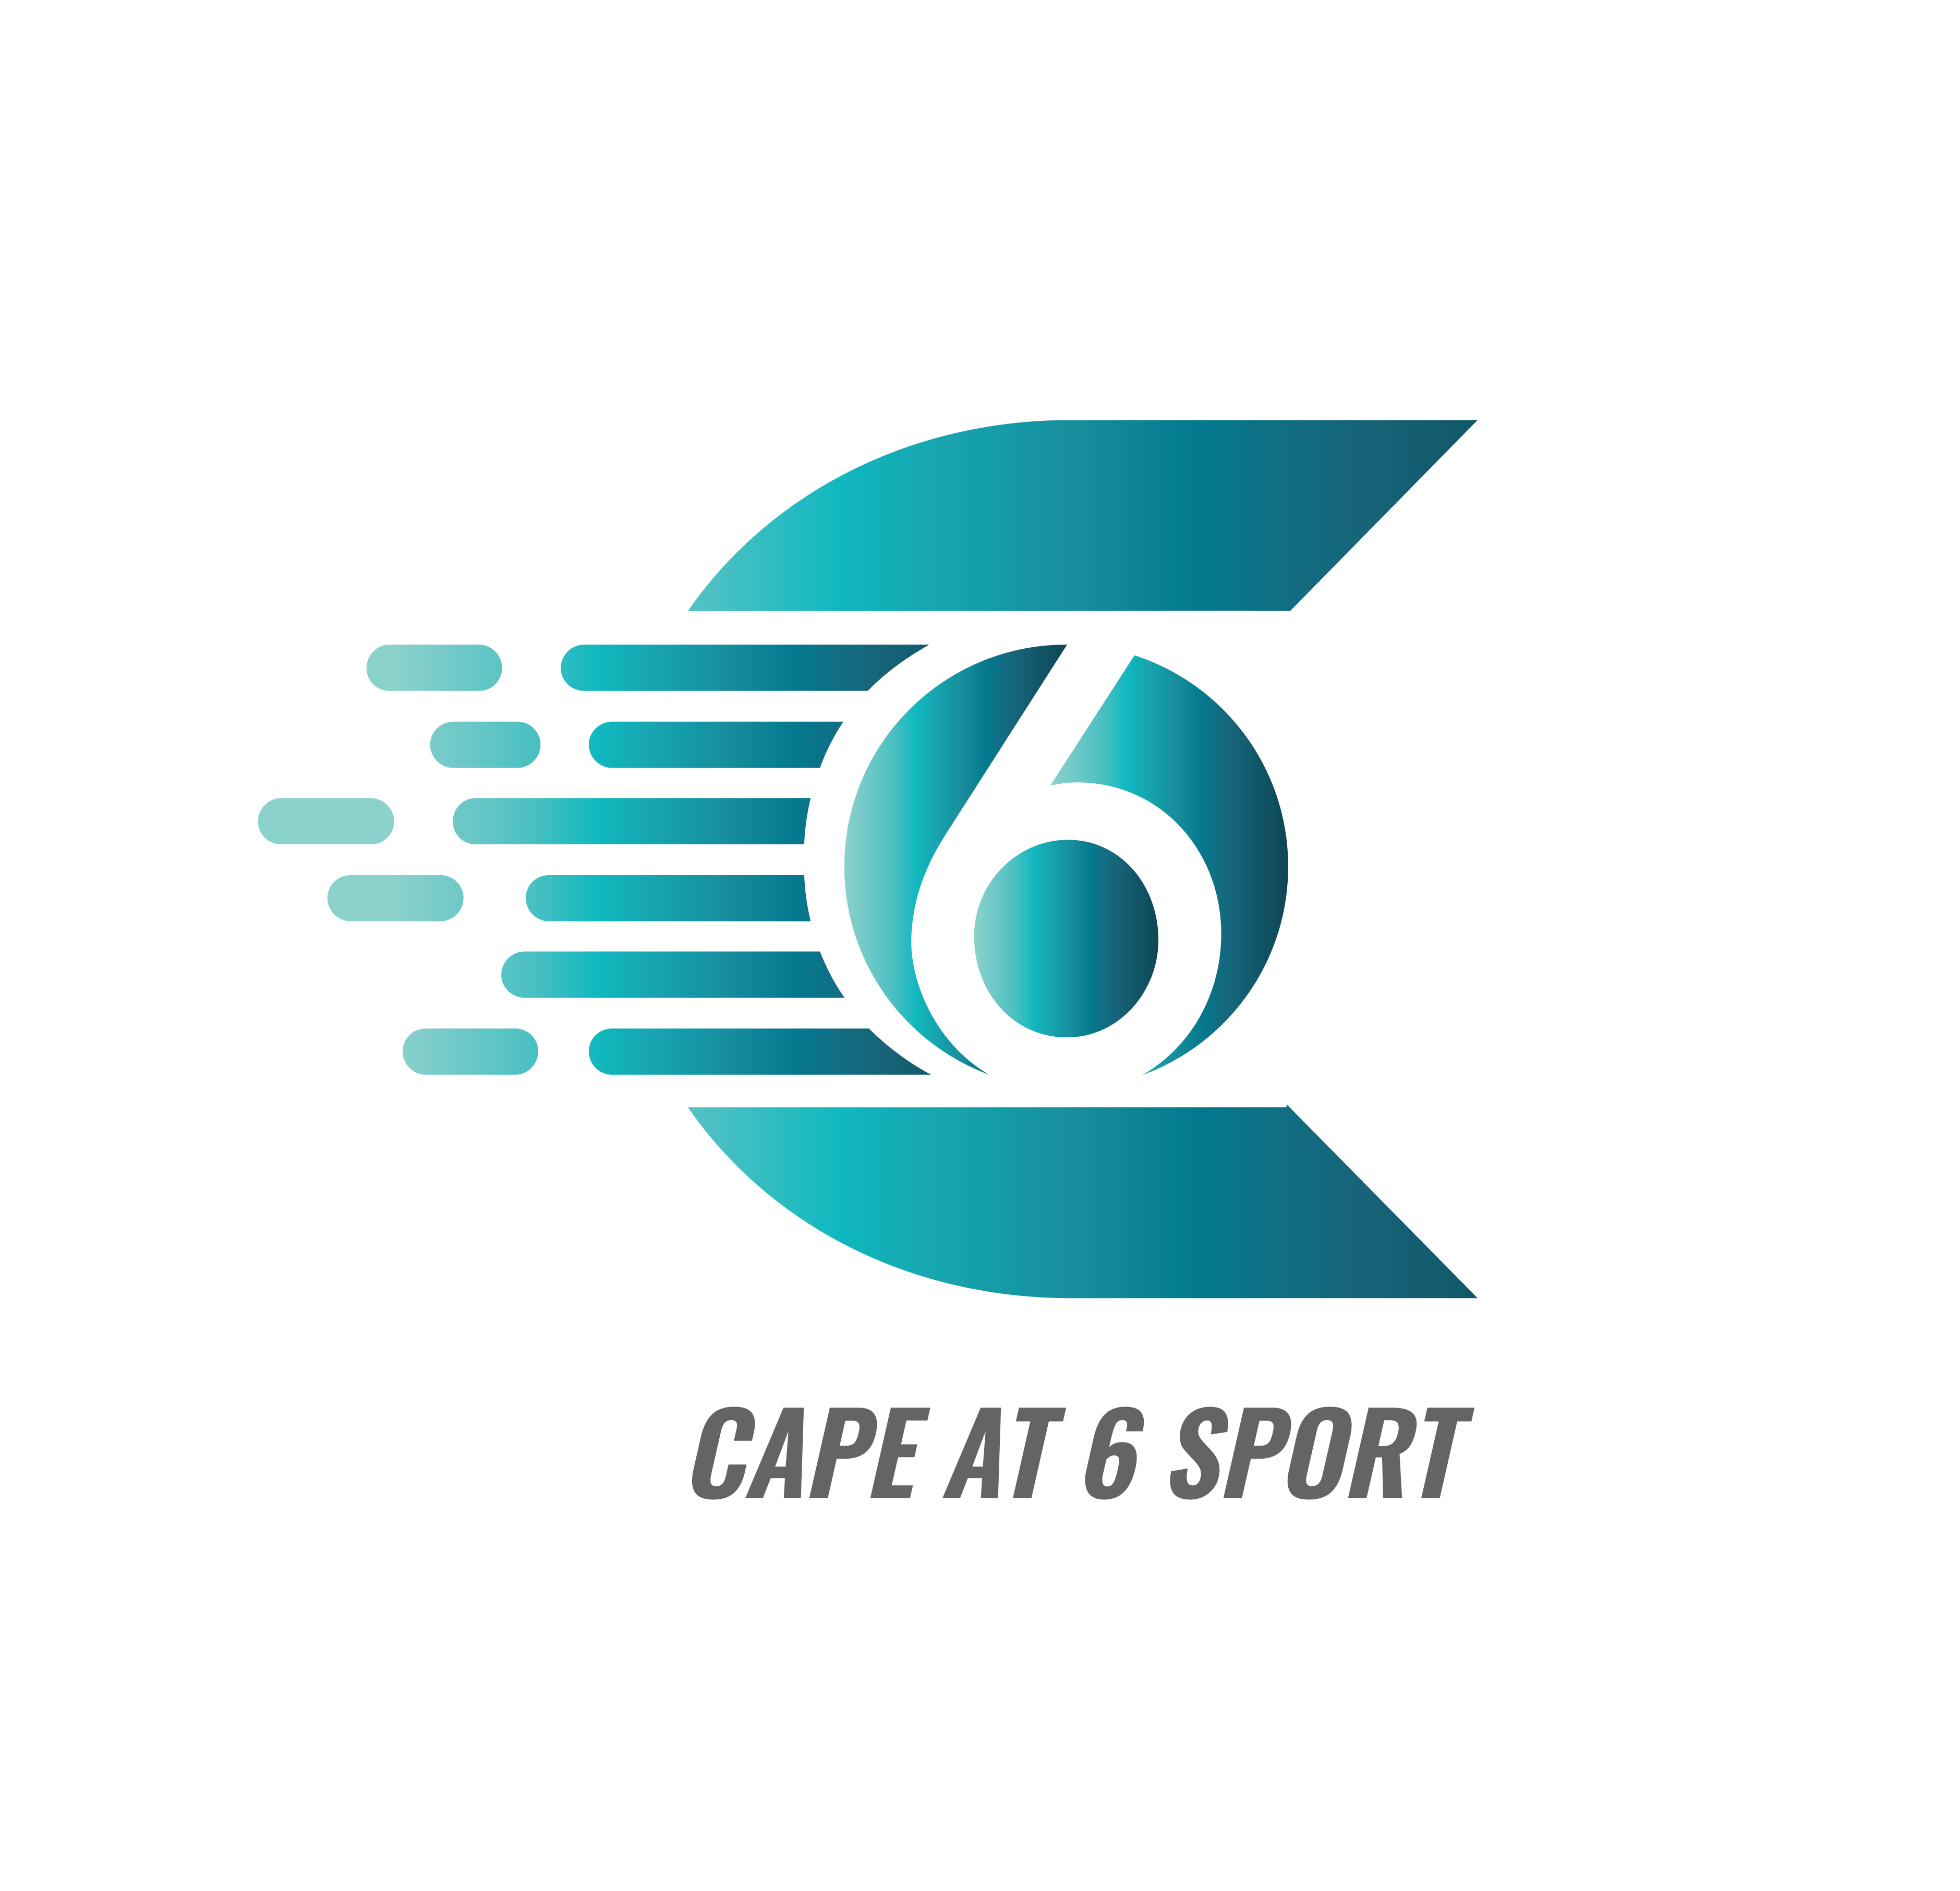 capeat6sport